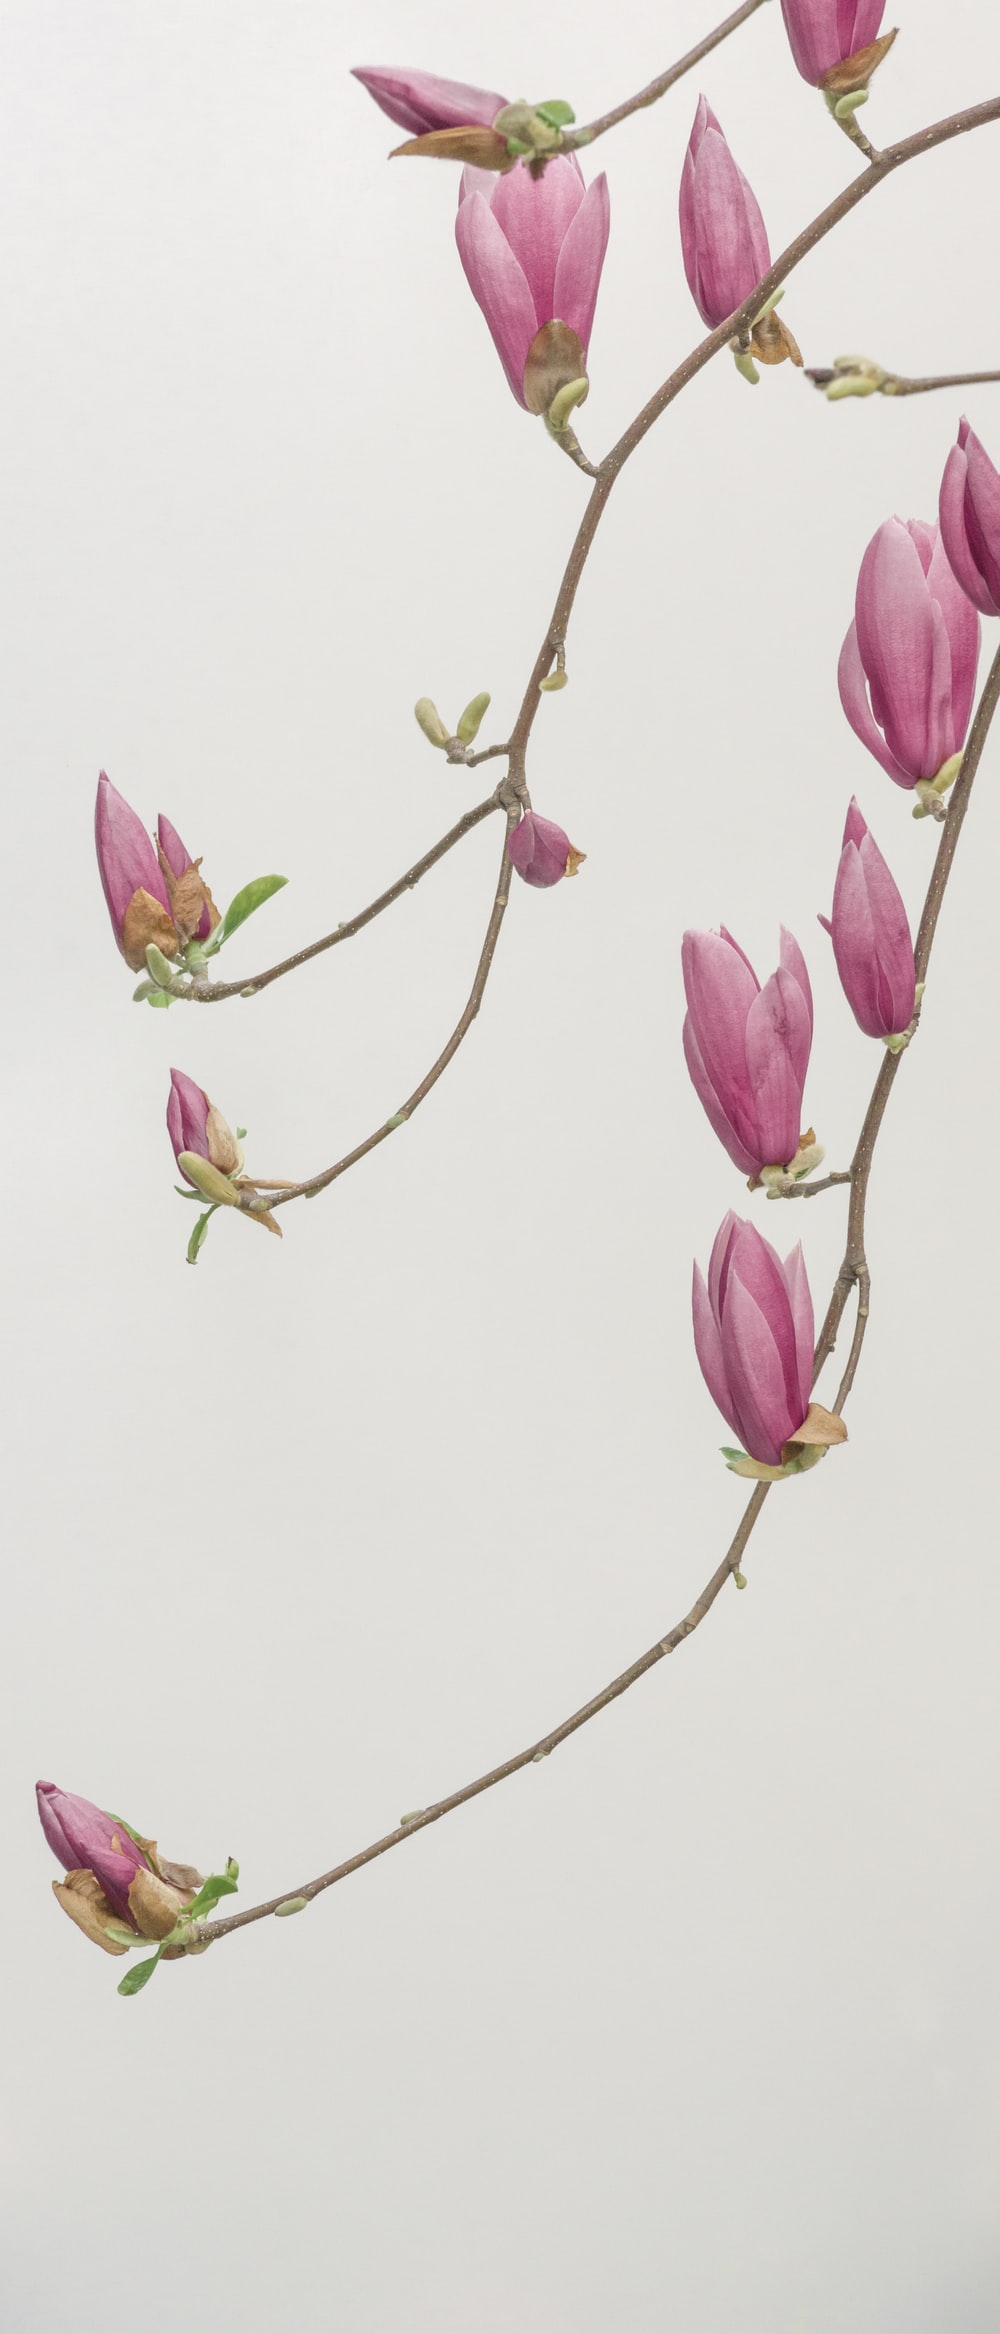 pink petaled flowers wallpaper